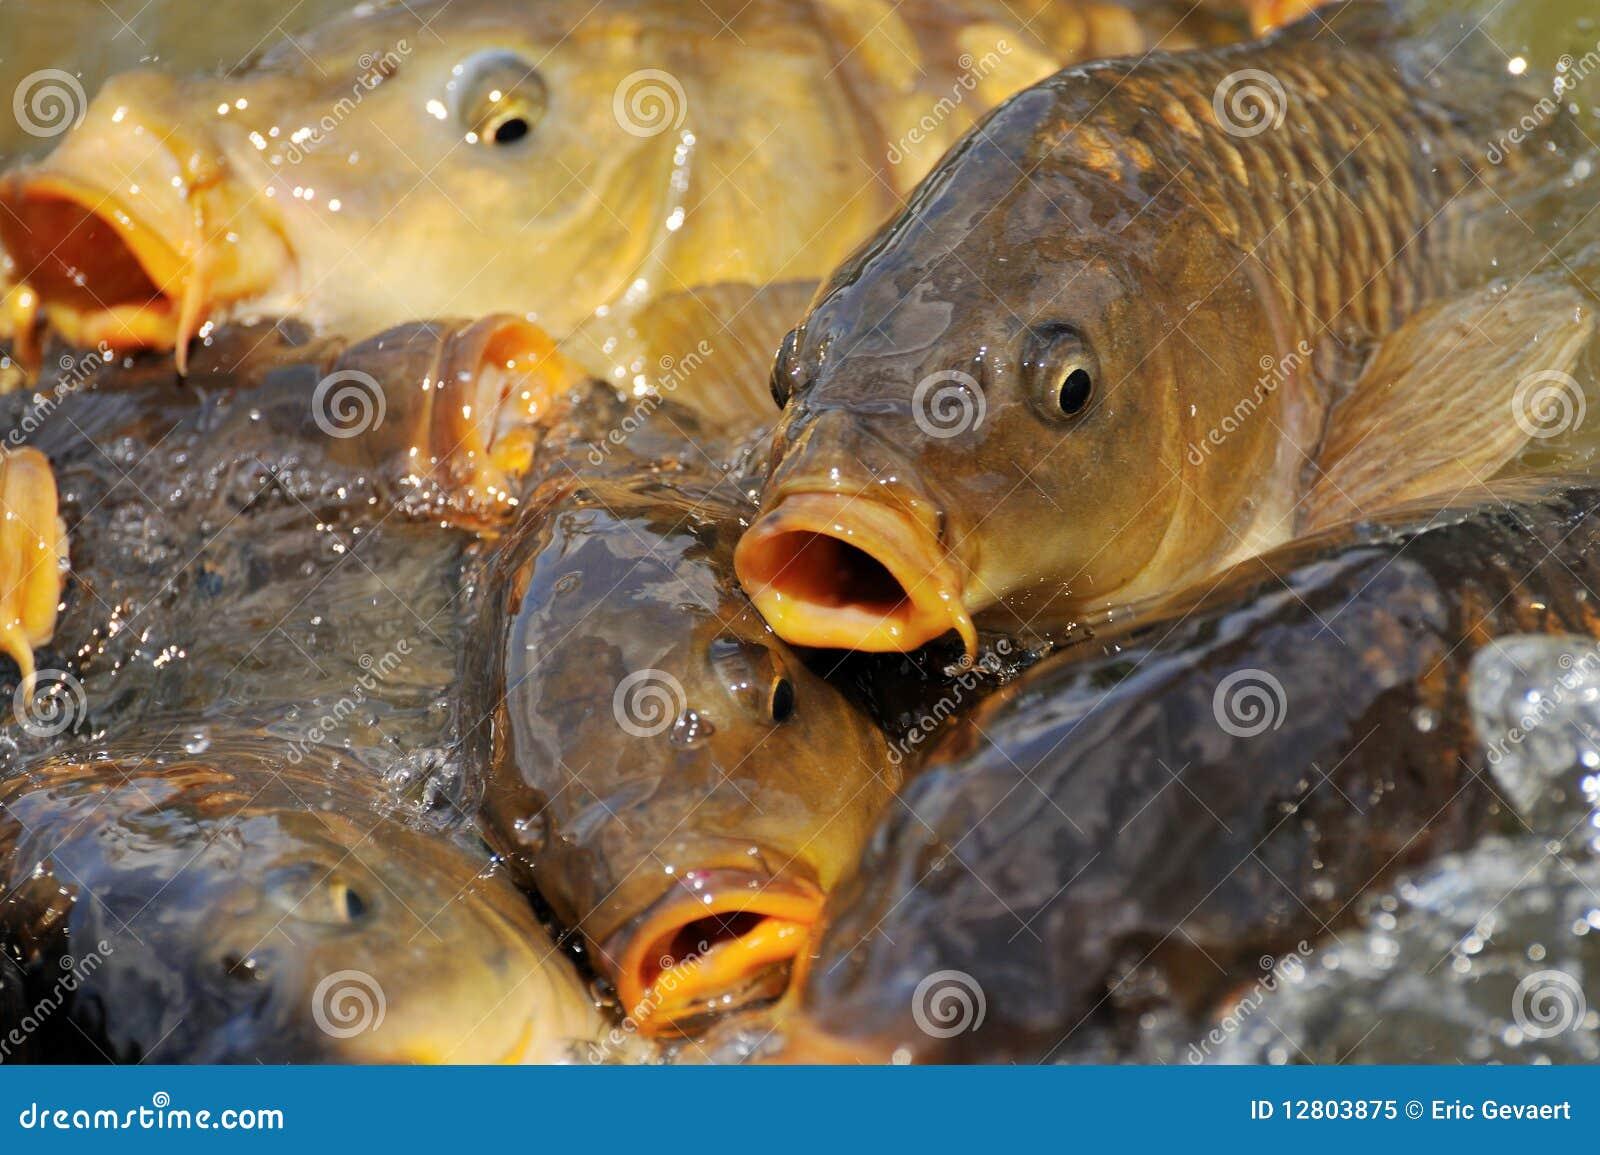 Lots of carp fish royalty free stock photo image 12803875 for Lot of fish